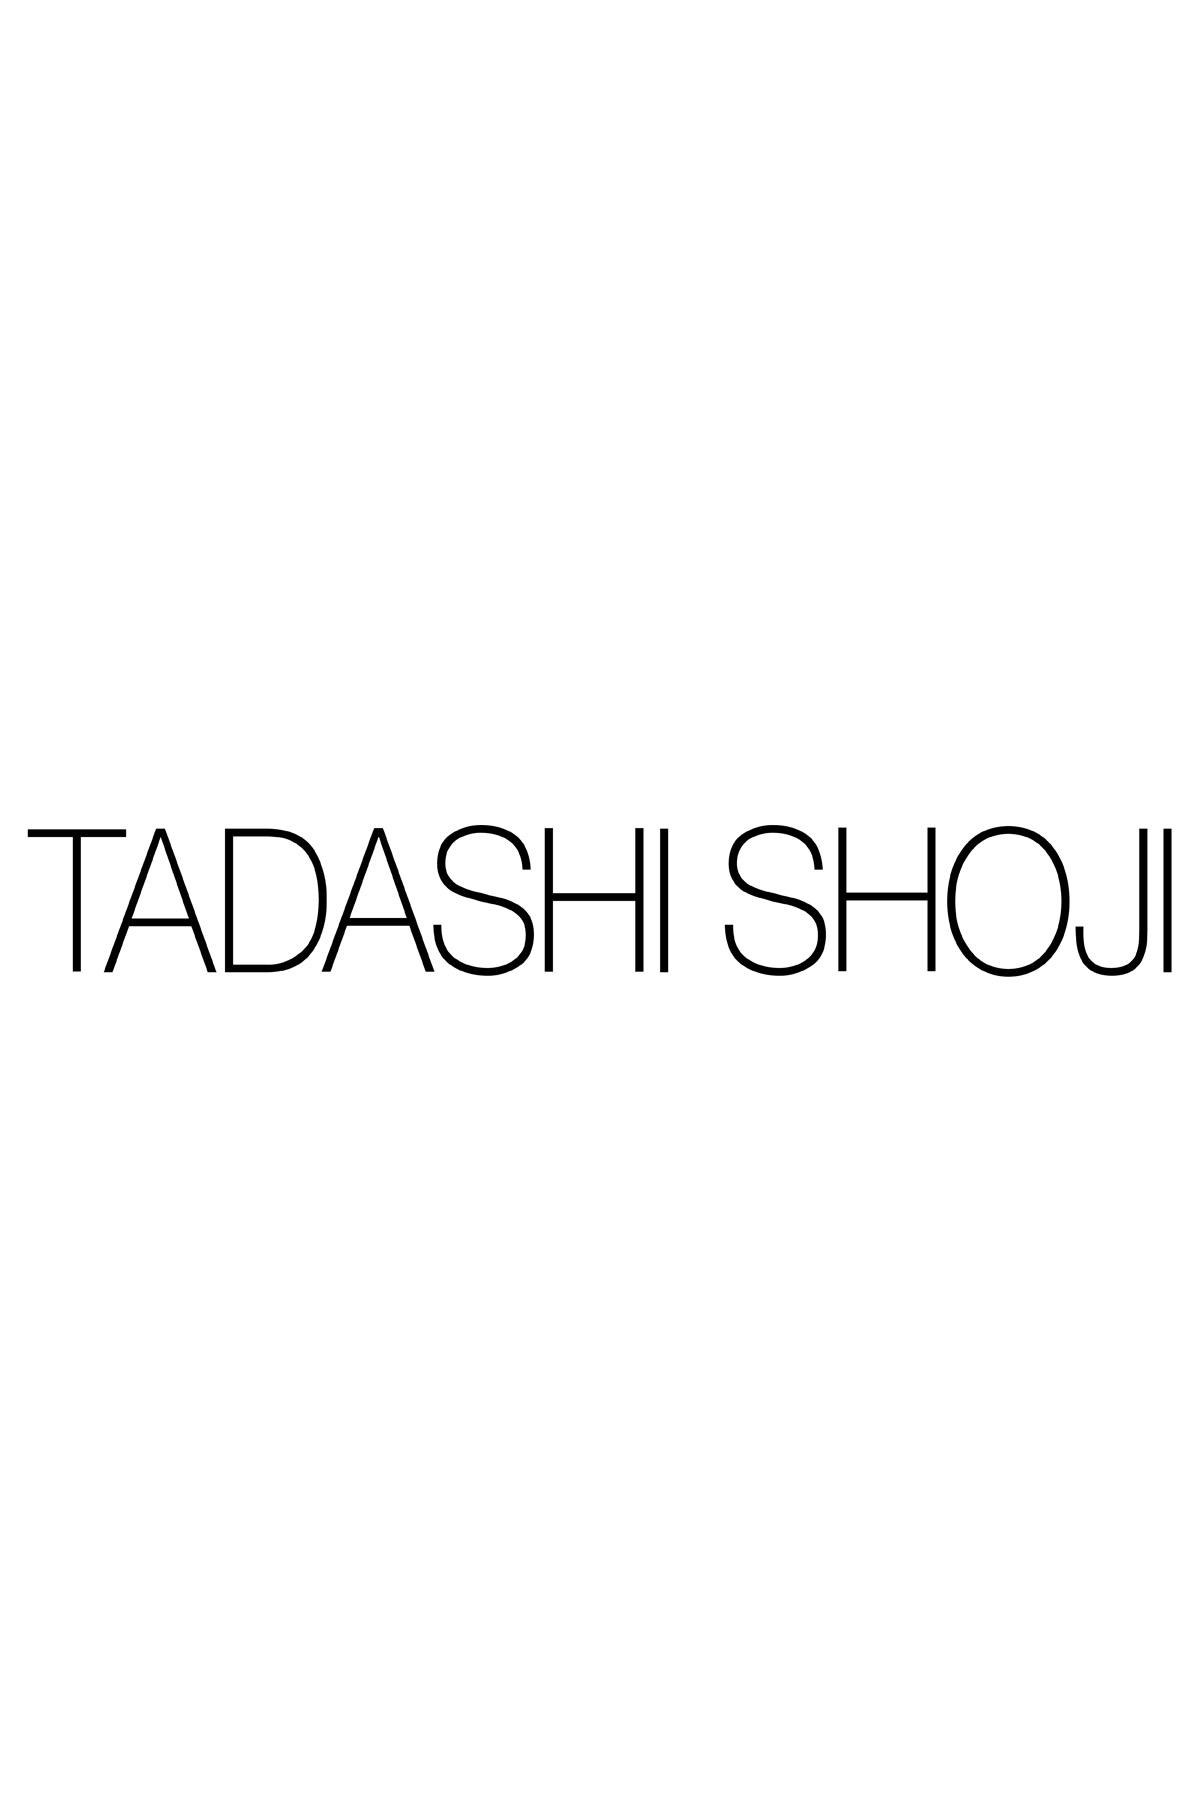 Tadashi Shoji - Corded Embroidery on Tulle A-Line Dress